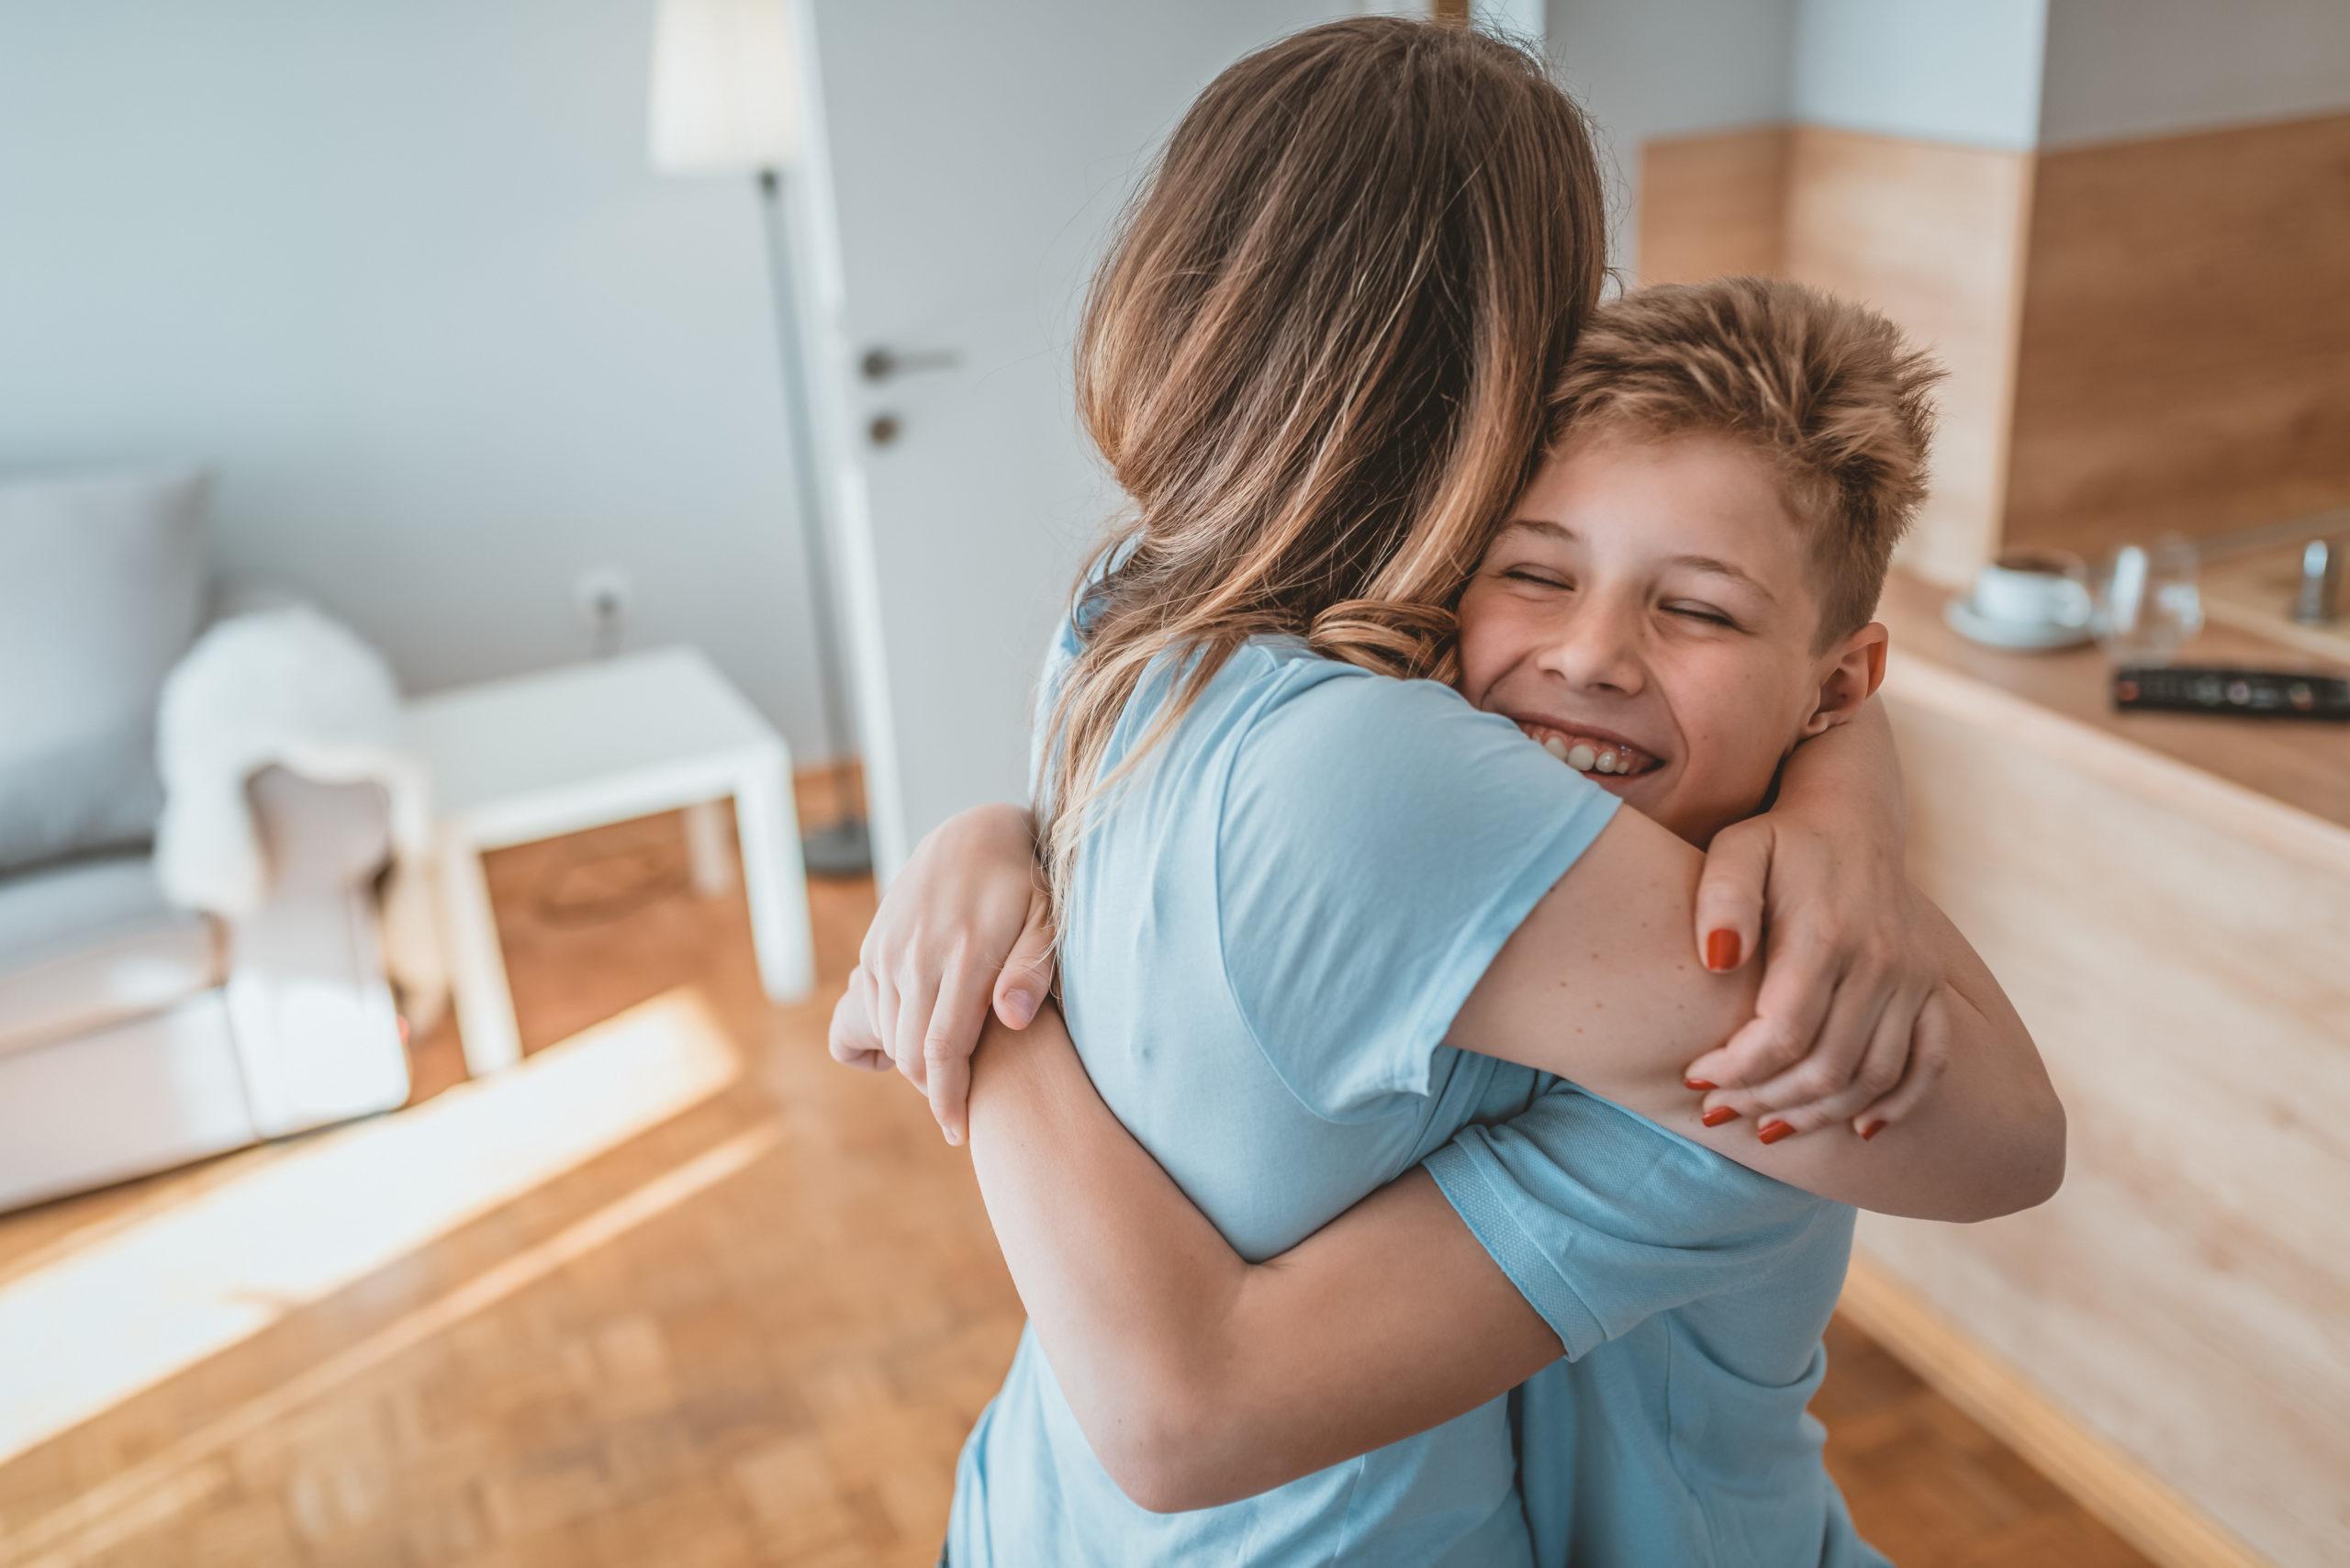 my child doesn't like hugs